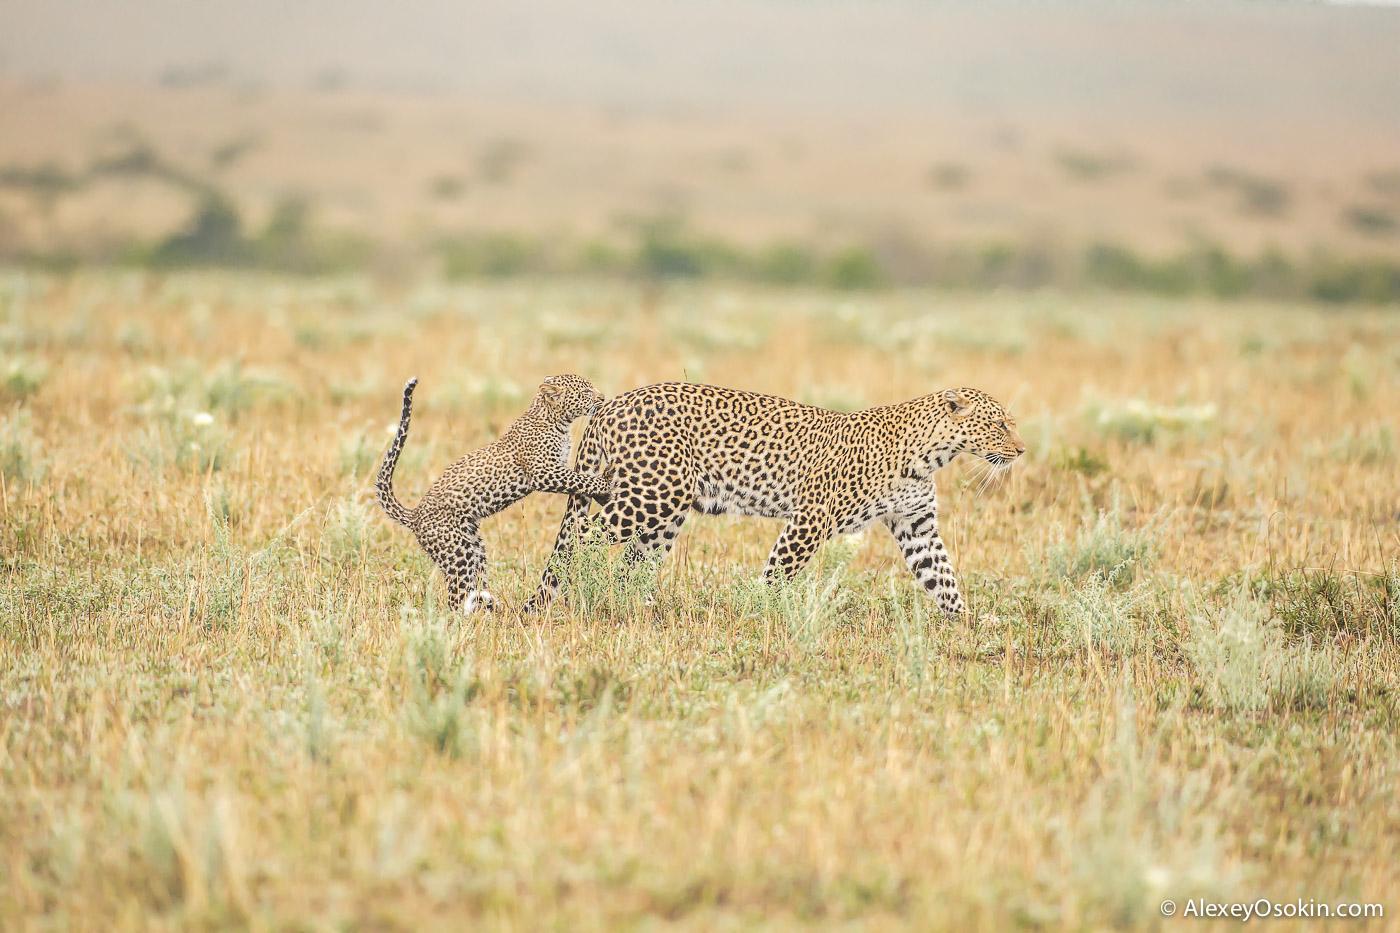 Leopard_lerean_poly_ao. oct.2015-38.jpg